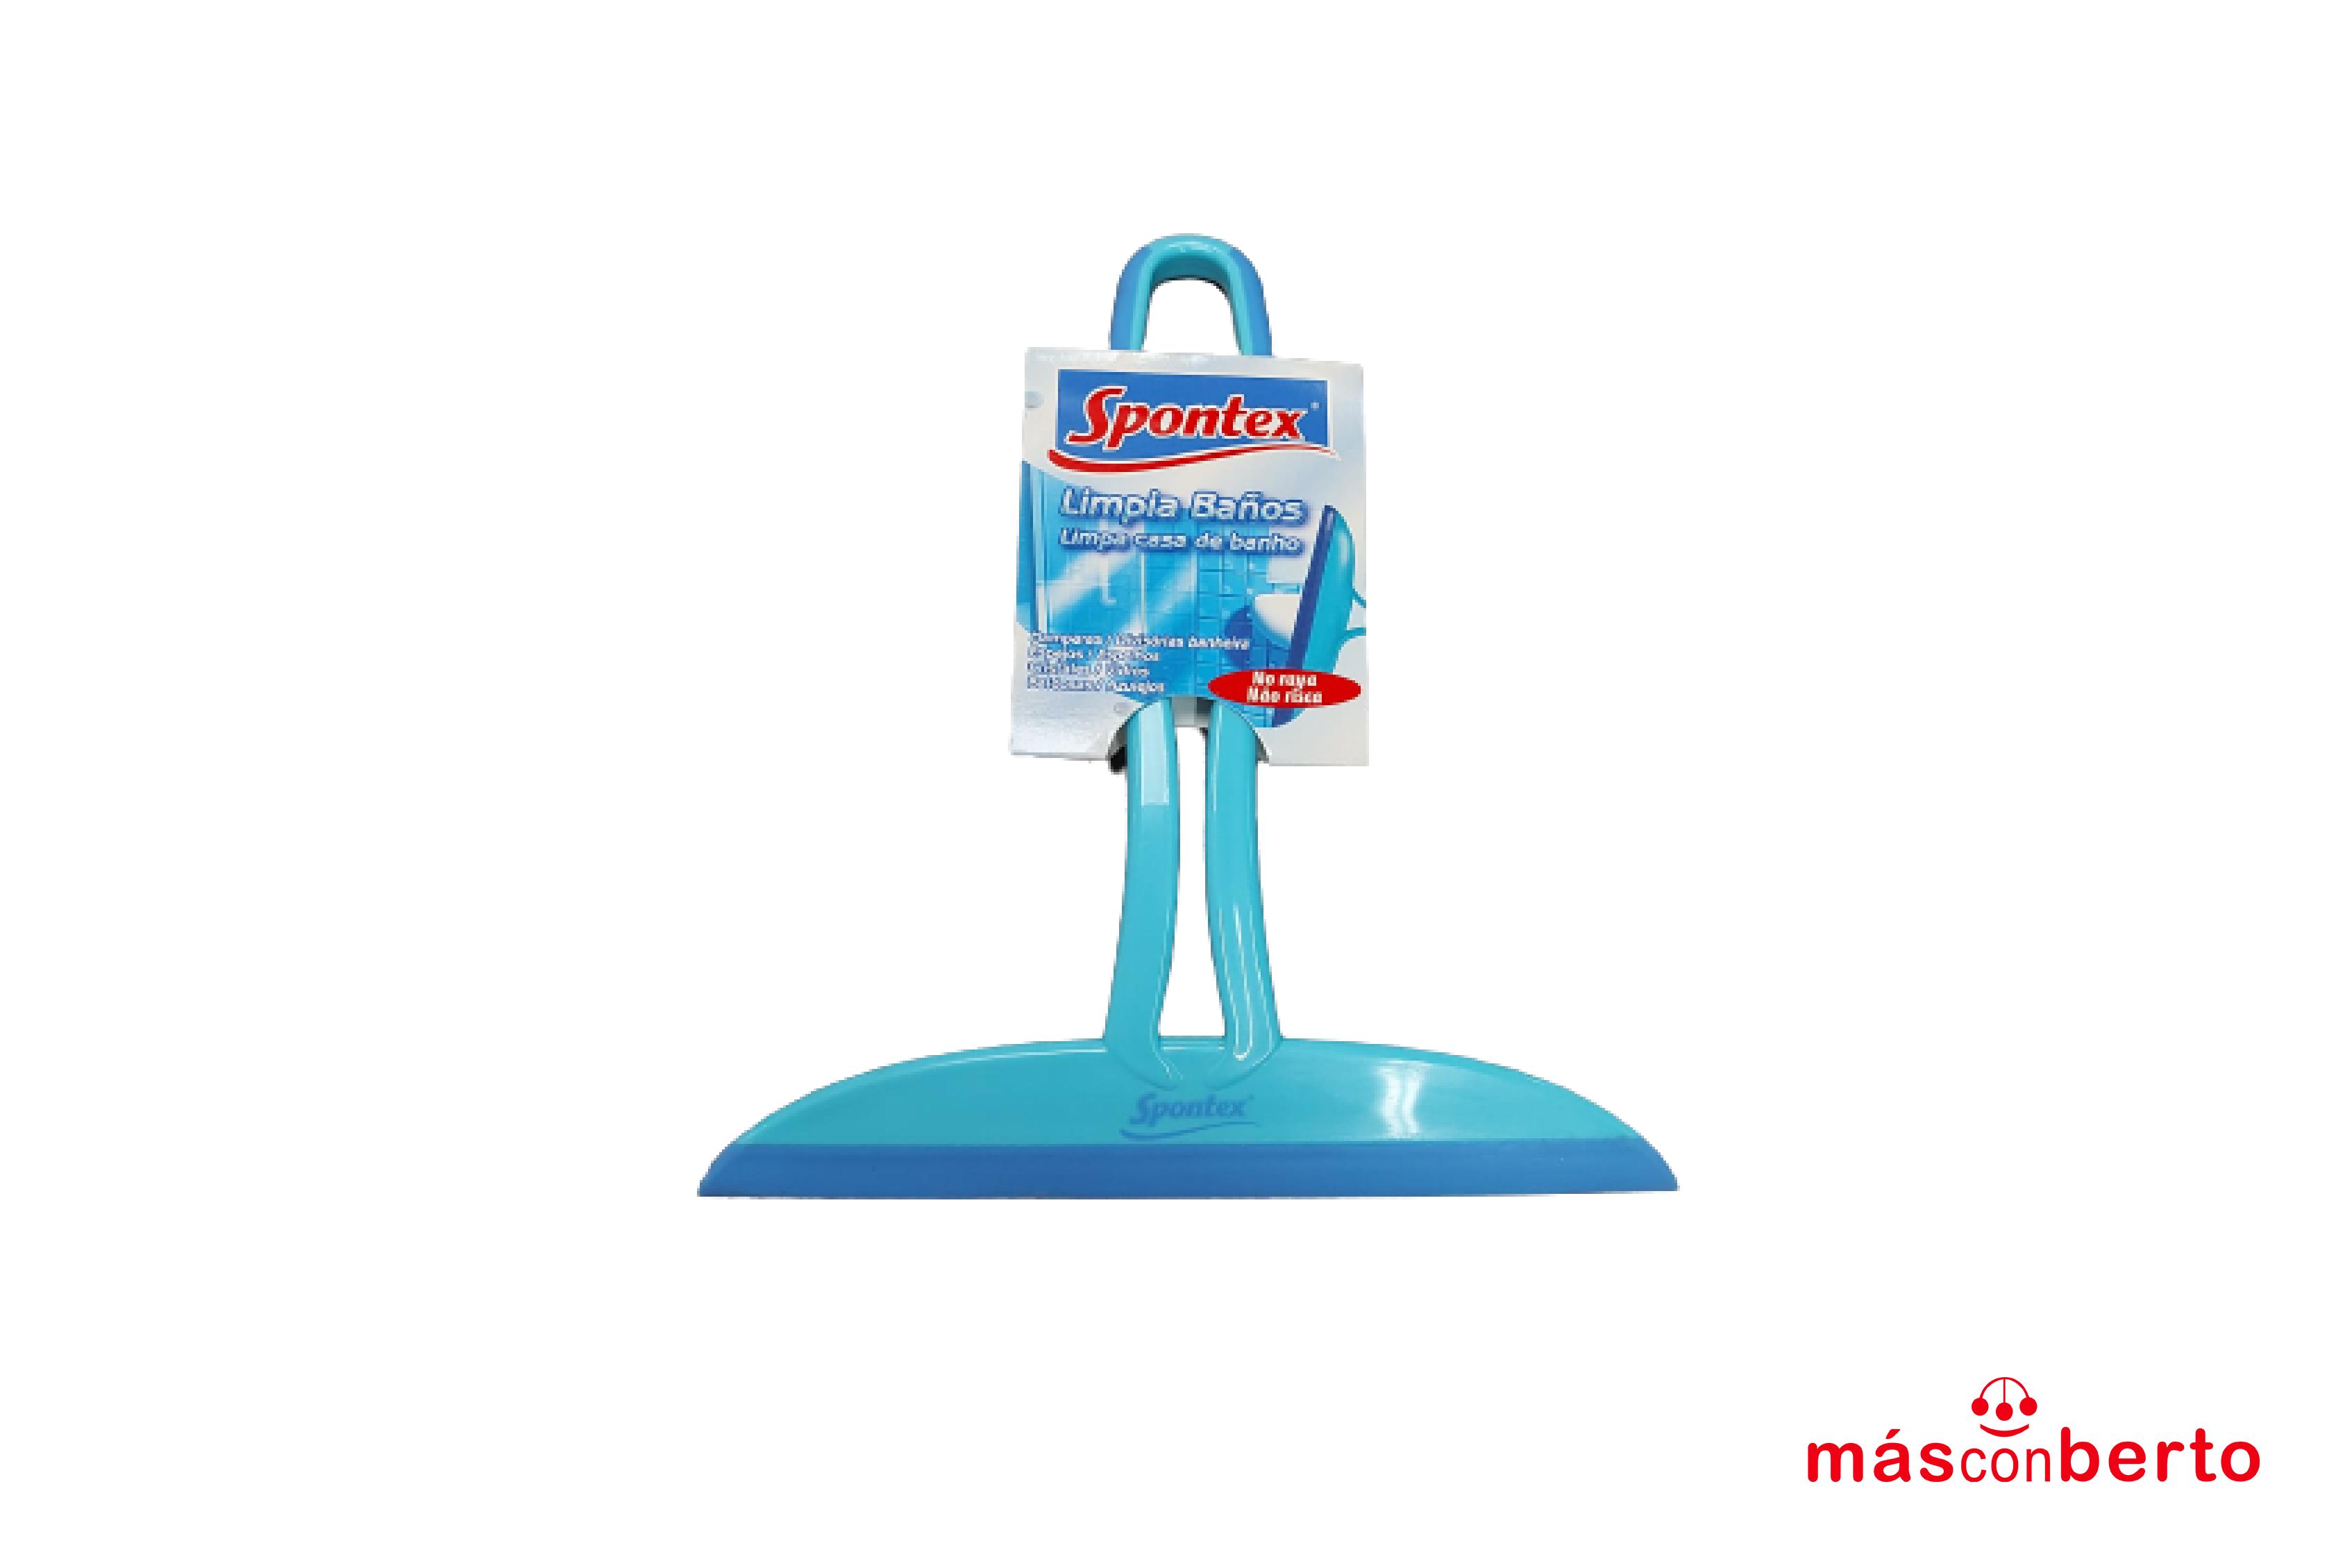 Limpia mamparas manual Spontex